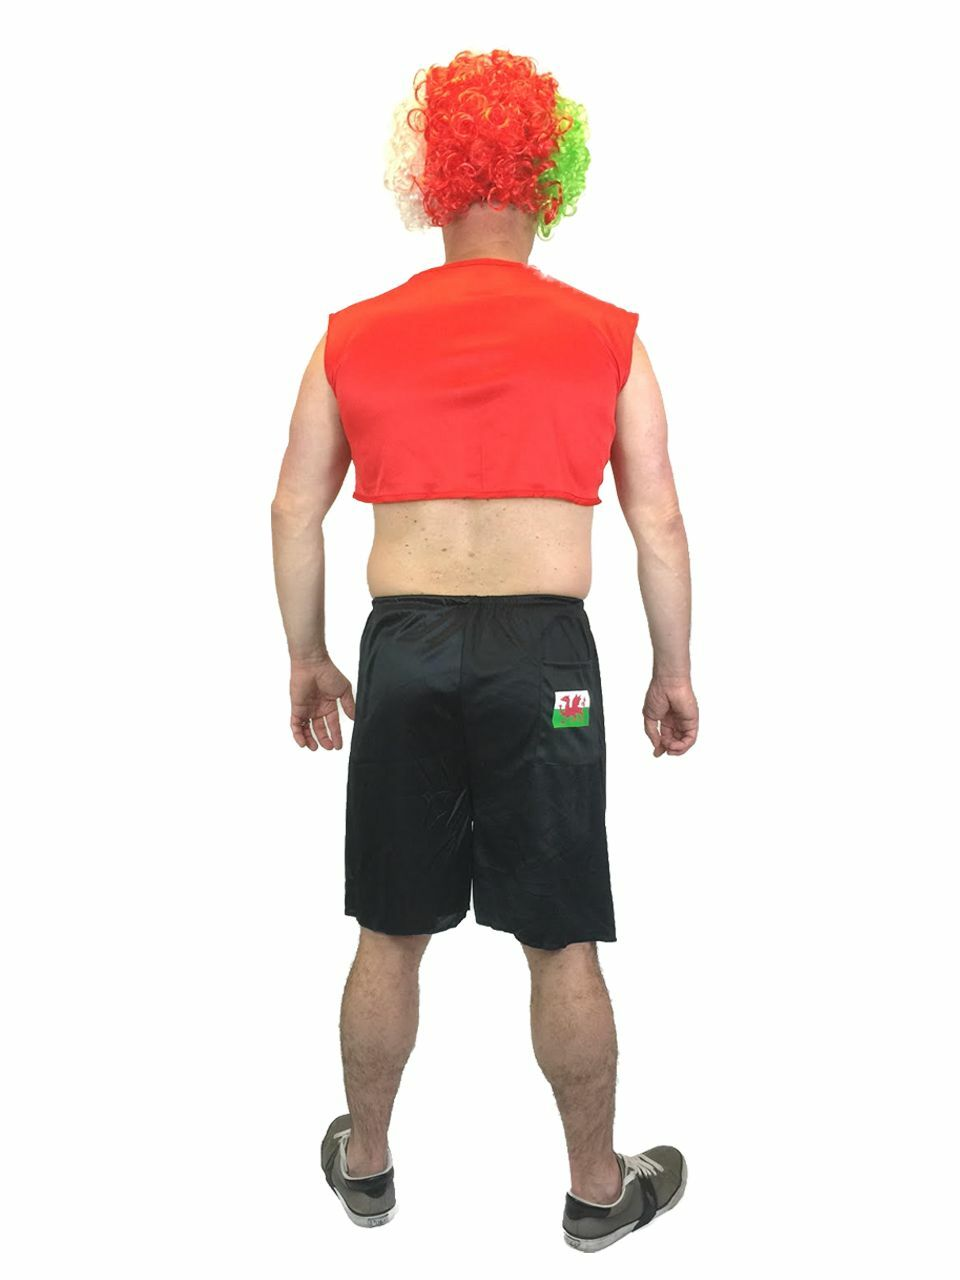 Herren Herren Herren Lustige Droopers Kostüm Groß Saggy Brüste Weltmeisterschaft Flag   Großhandel    Spaß    Outlet Store  df1e13